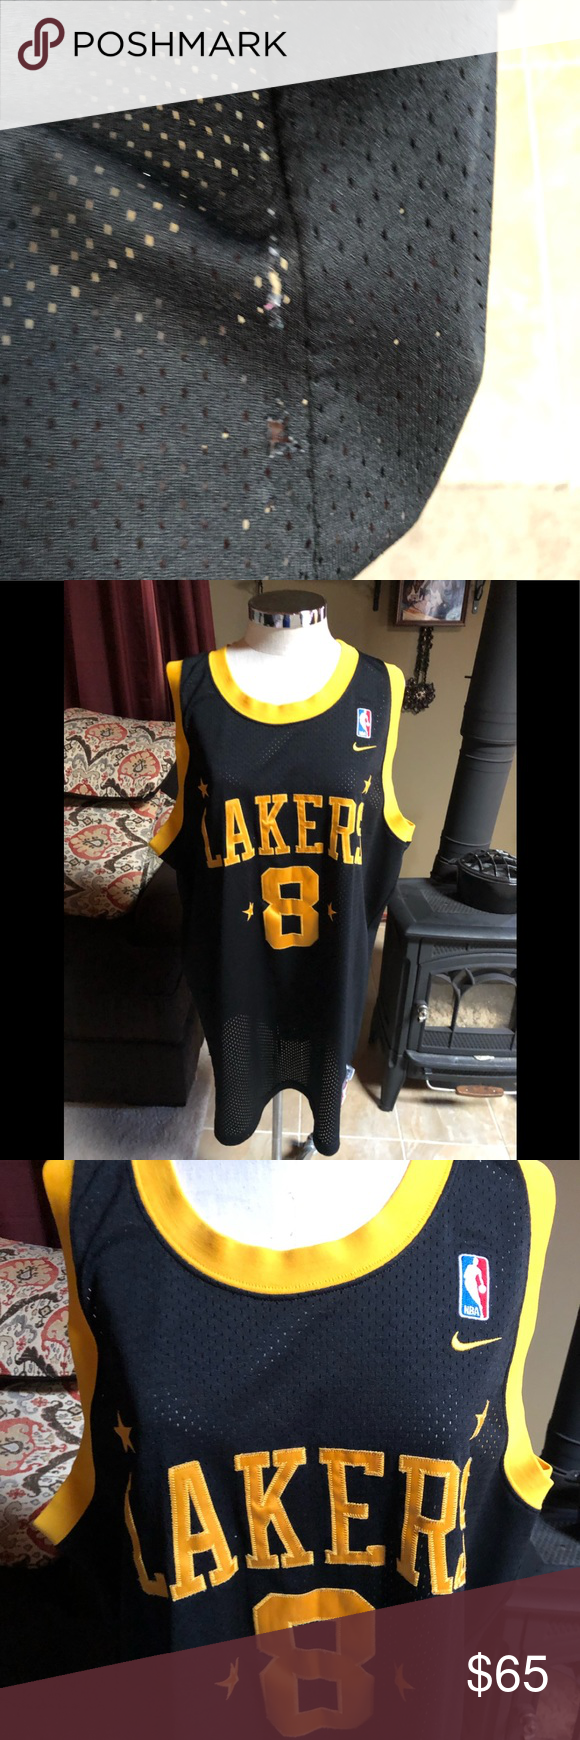 Kobe Bryant Lakers Jersey Kobe Bryant Lakers Kobe Bryant Basketball Clothes